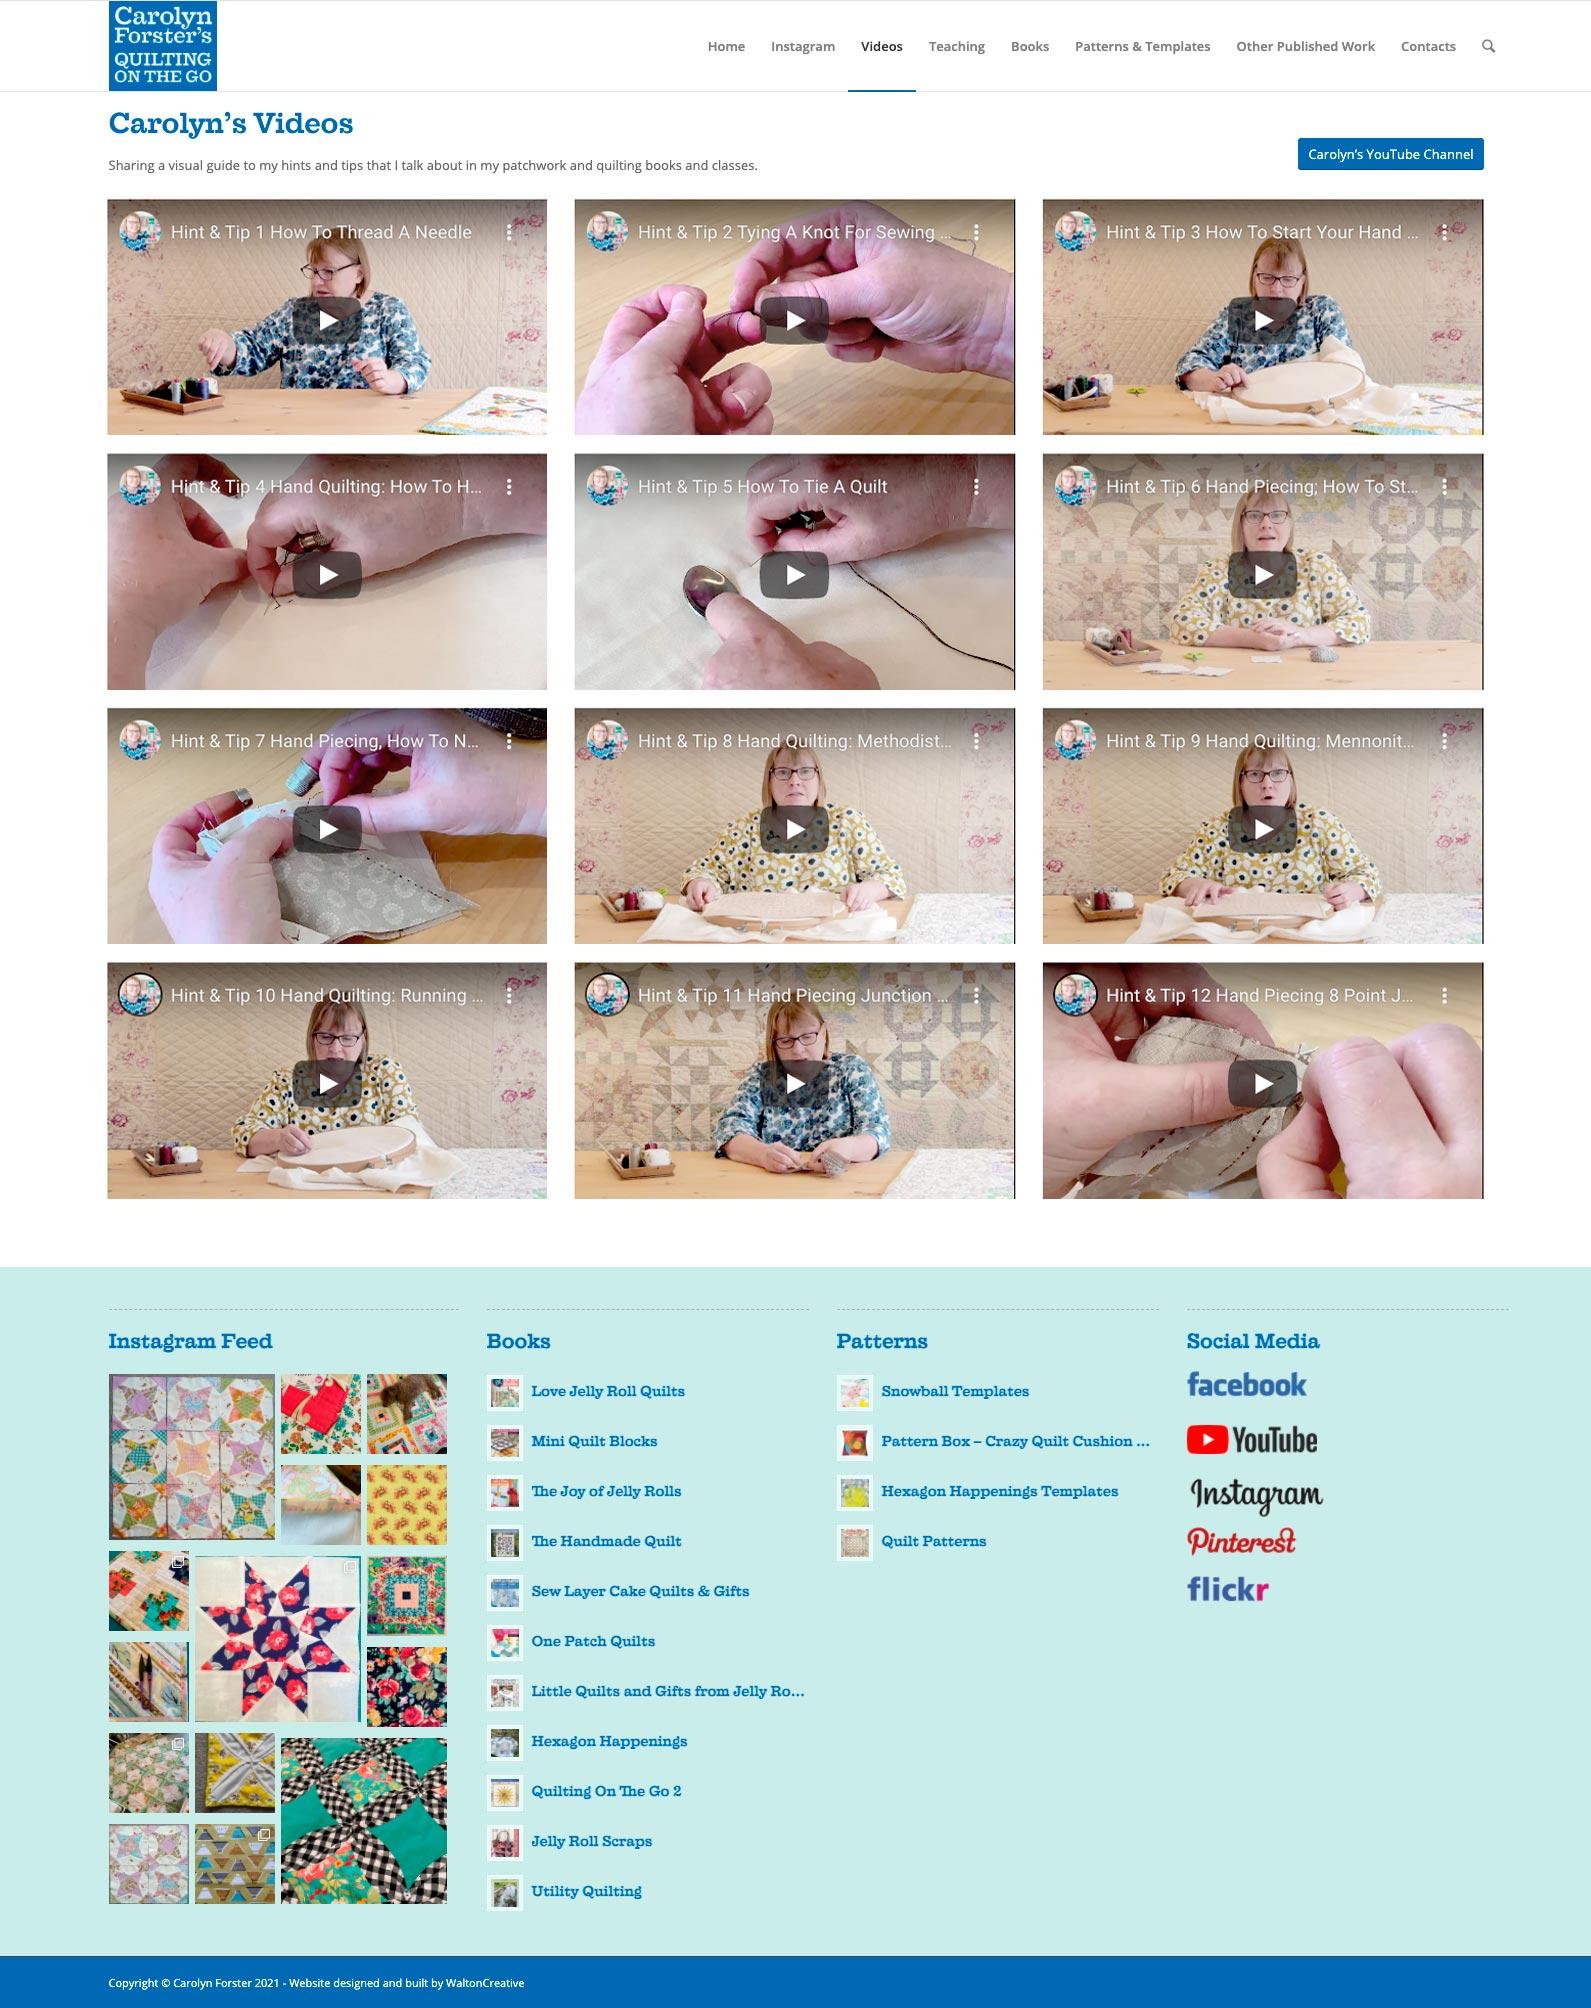 Carolyn Forster's Website Design 4 Videos